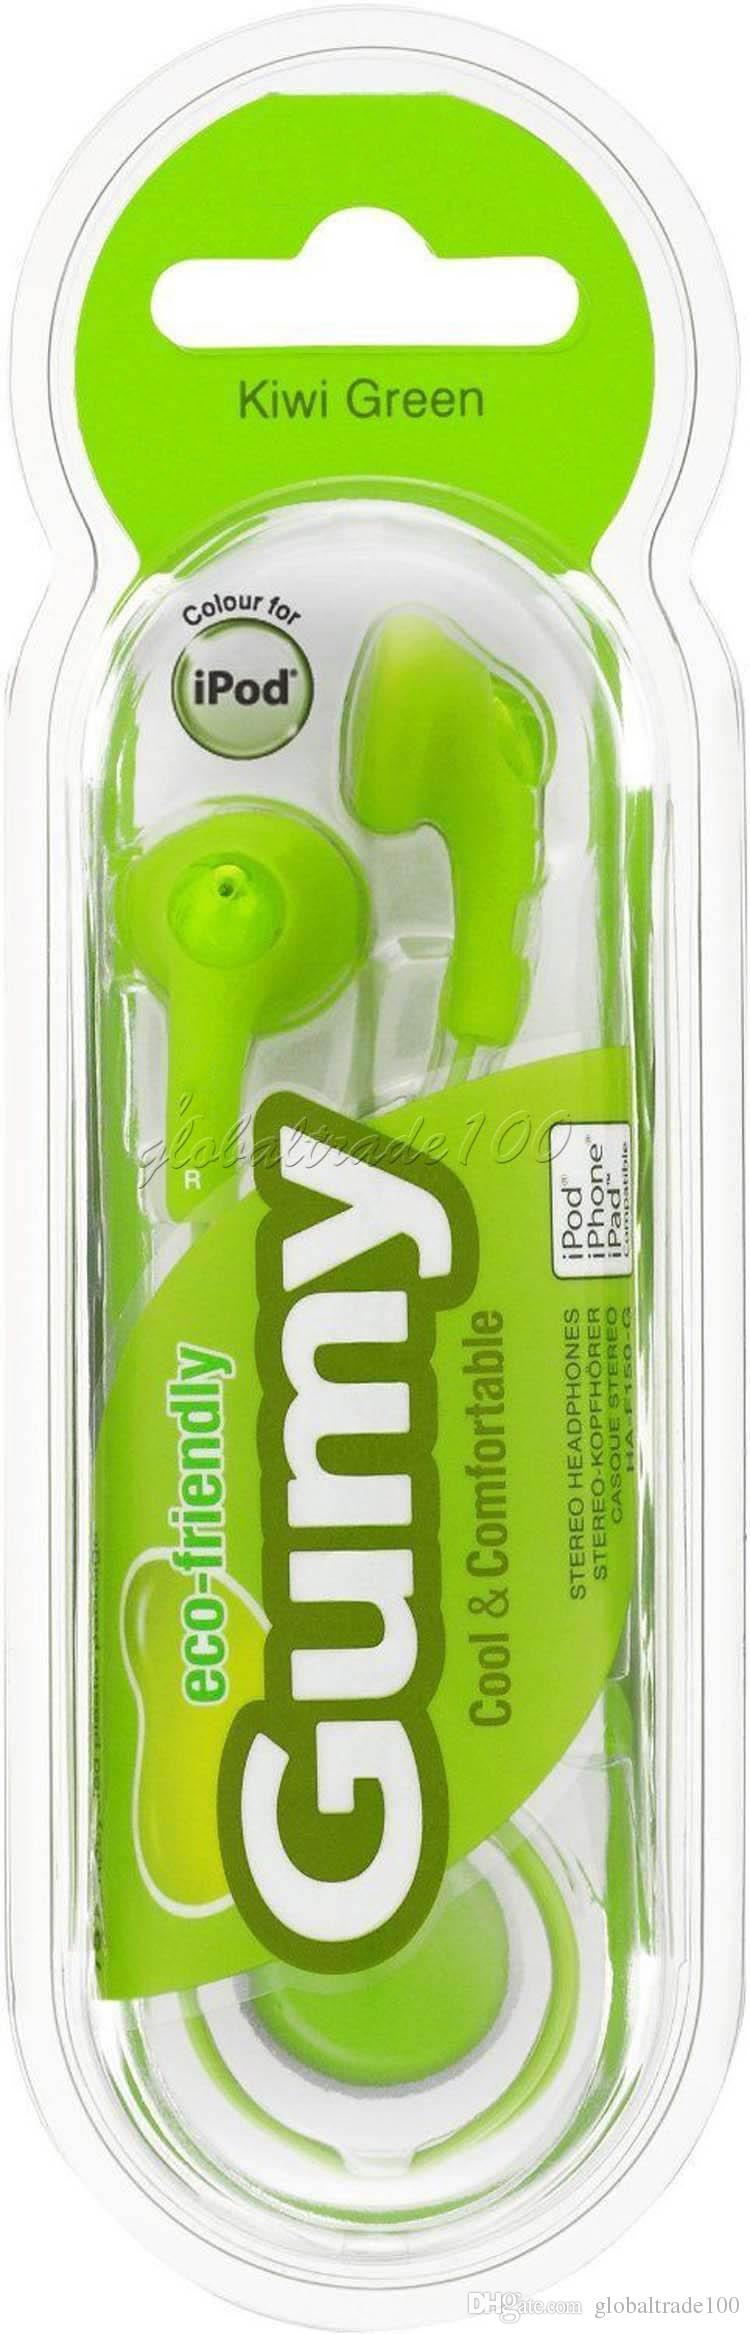 Gumy Gummy Auricular HA F150 3.5mm MP3 Auriculares Auriculares No MIC Colorido para iphone ipad ipod Samsung HTC